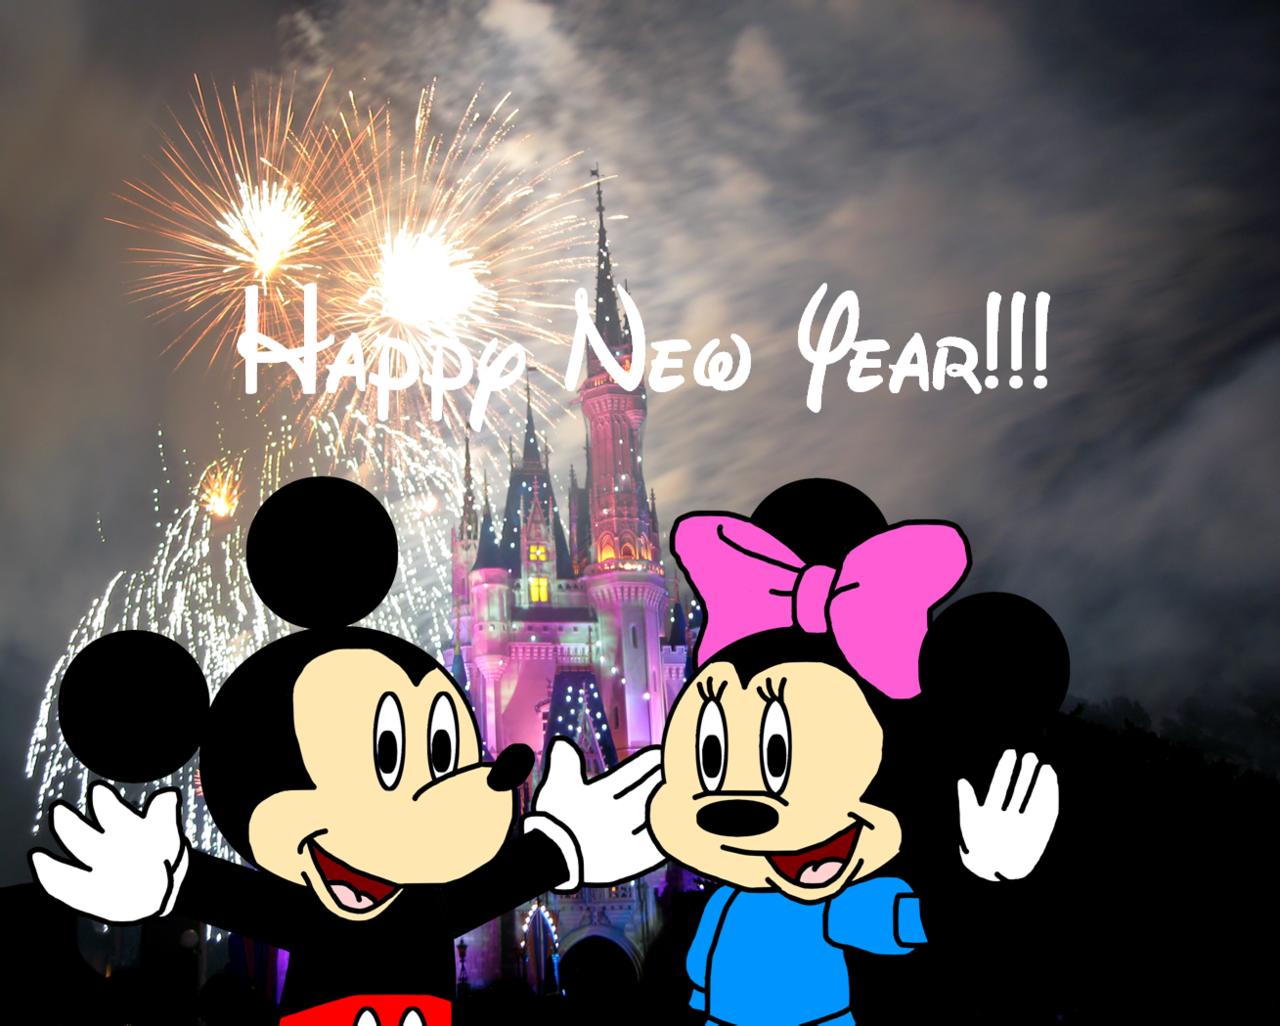 Mickey News Years Mickey and Minnie wish Happy New Year